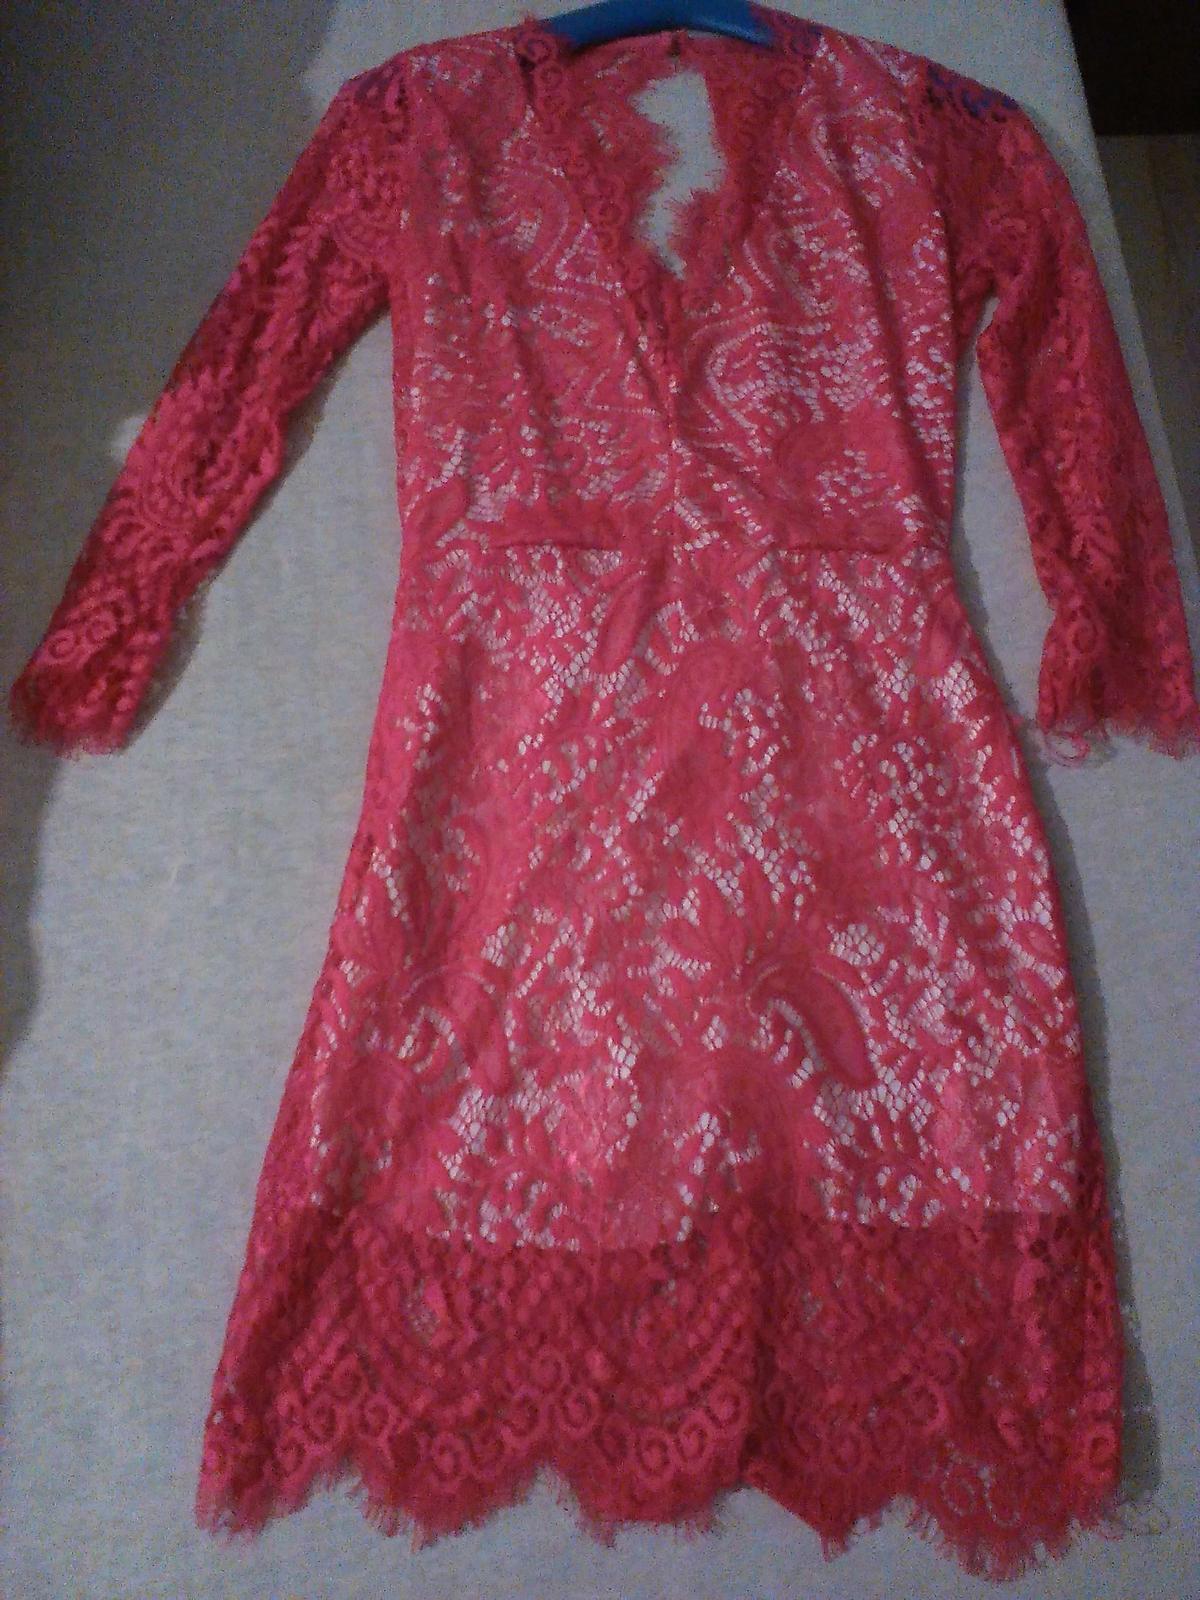 Čipkované červené šaty - cena už s poštovným - Obrázok č. 1